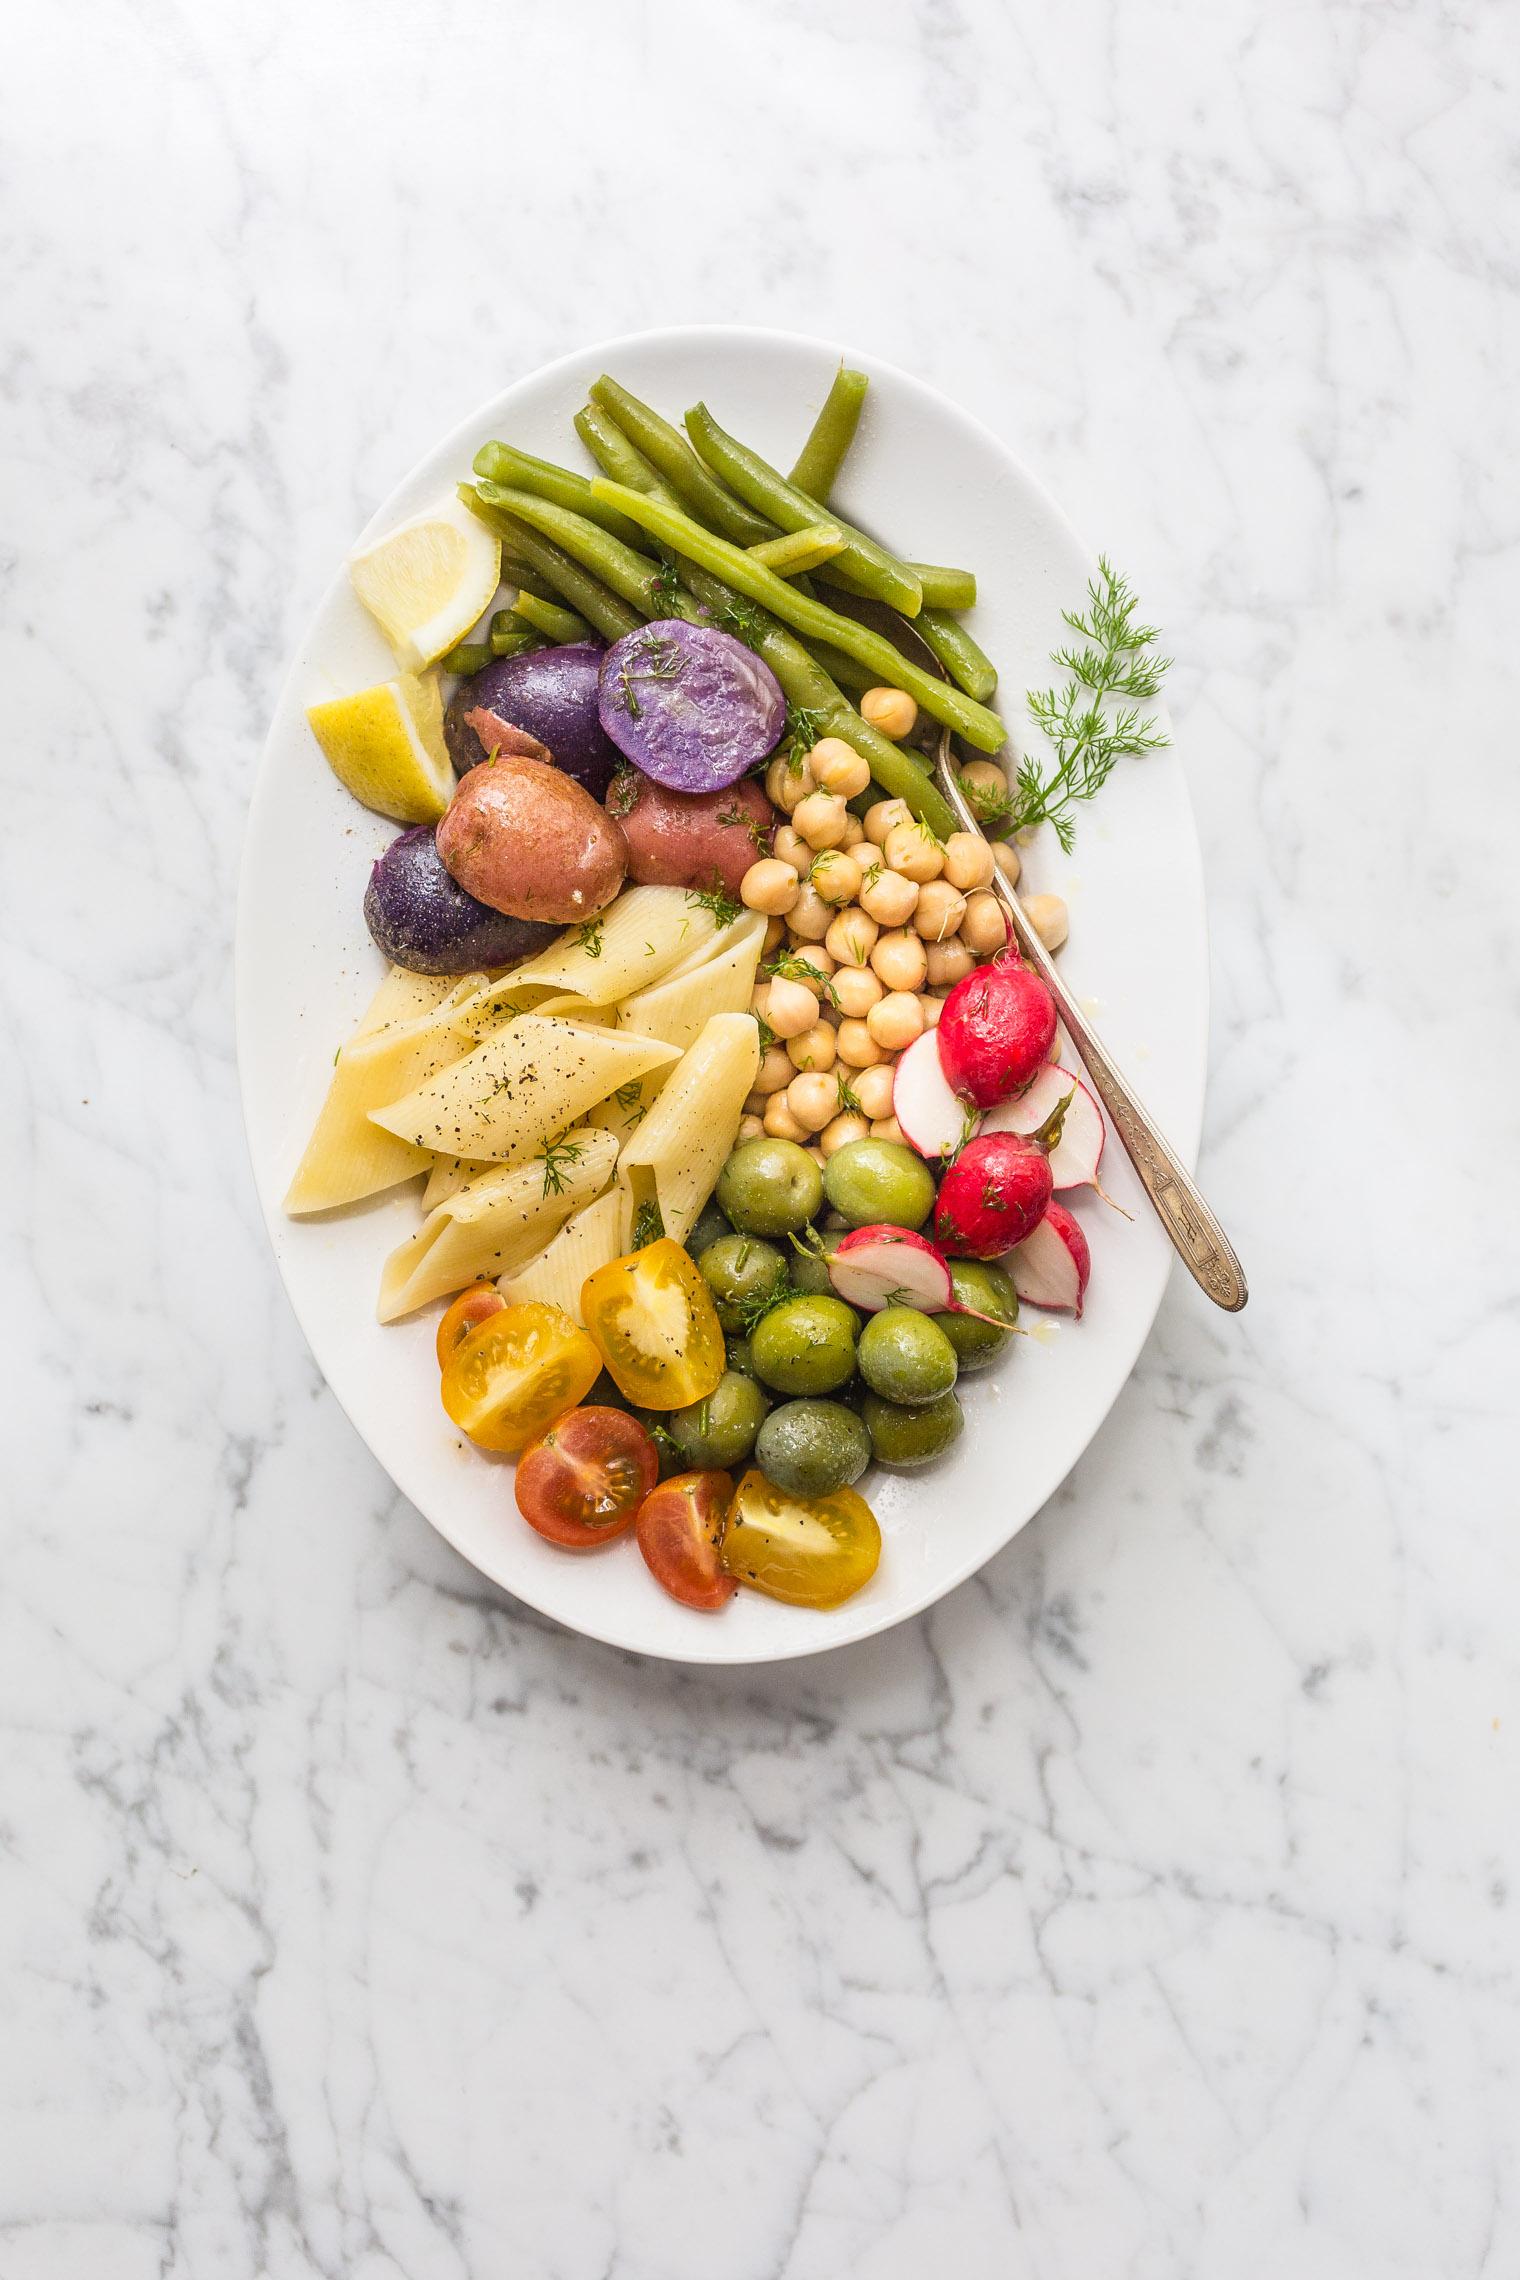 Vegetarian Summer Pasta Salad with Dill Vinaigrette